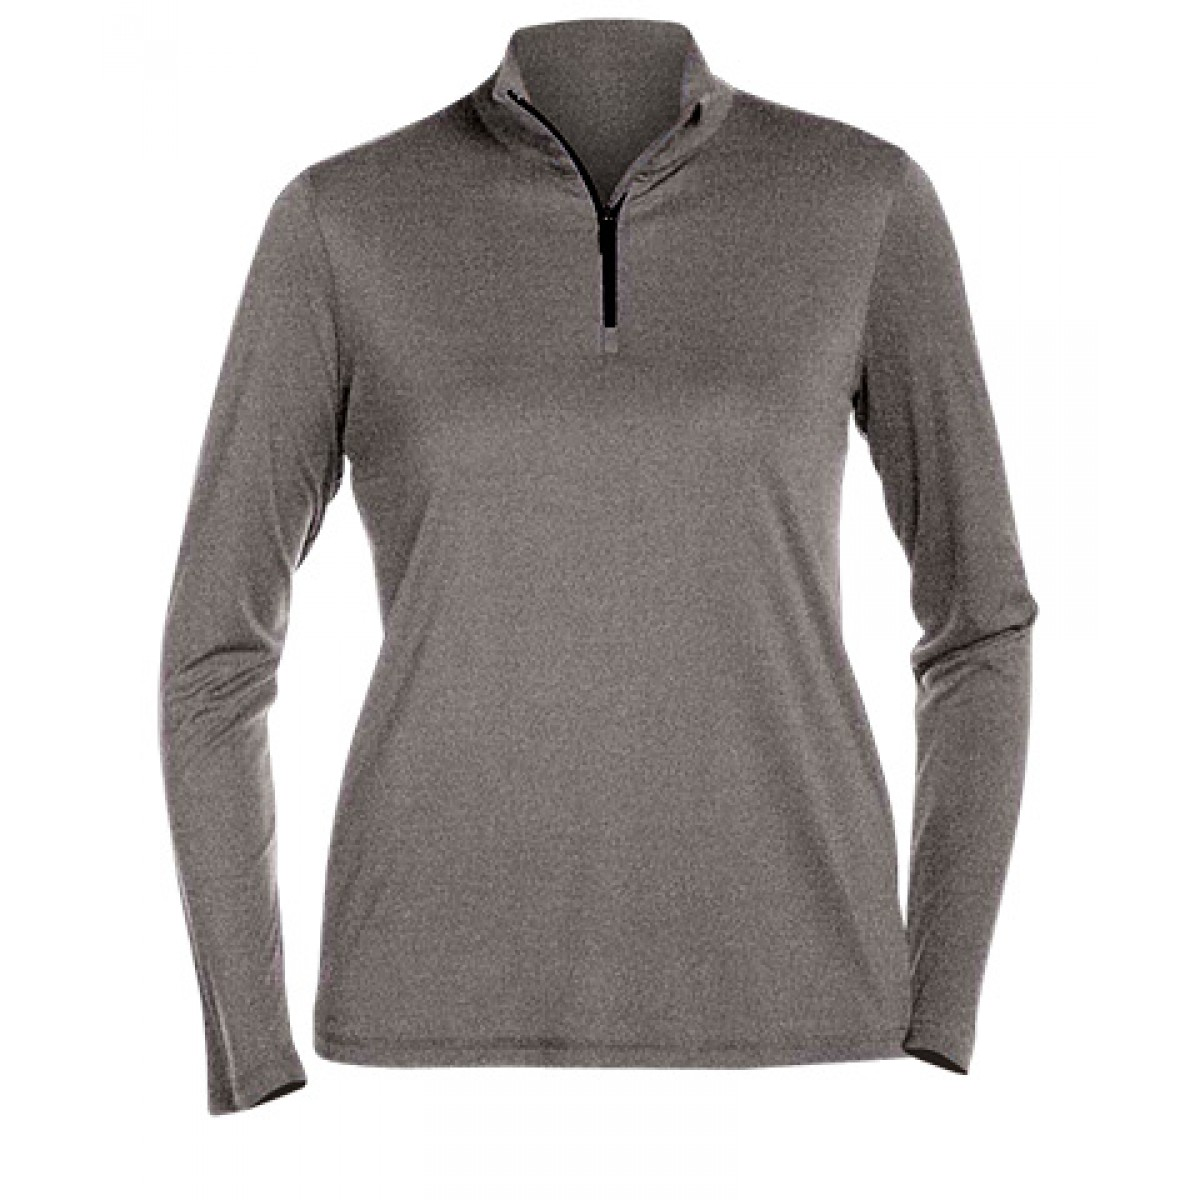 Ladies' Quarter-Zip Lightweight Pullover-Sports Grey-L